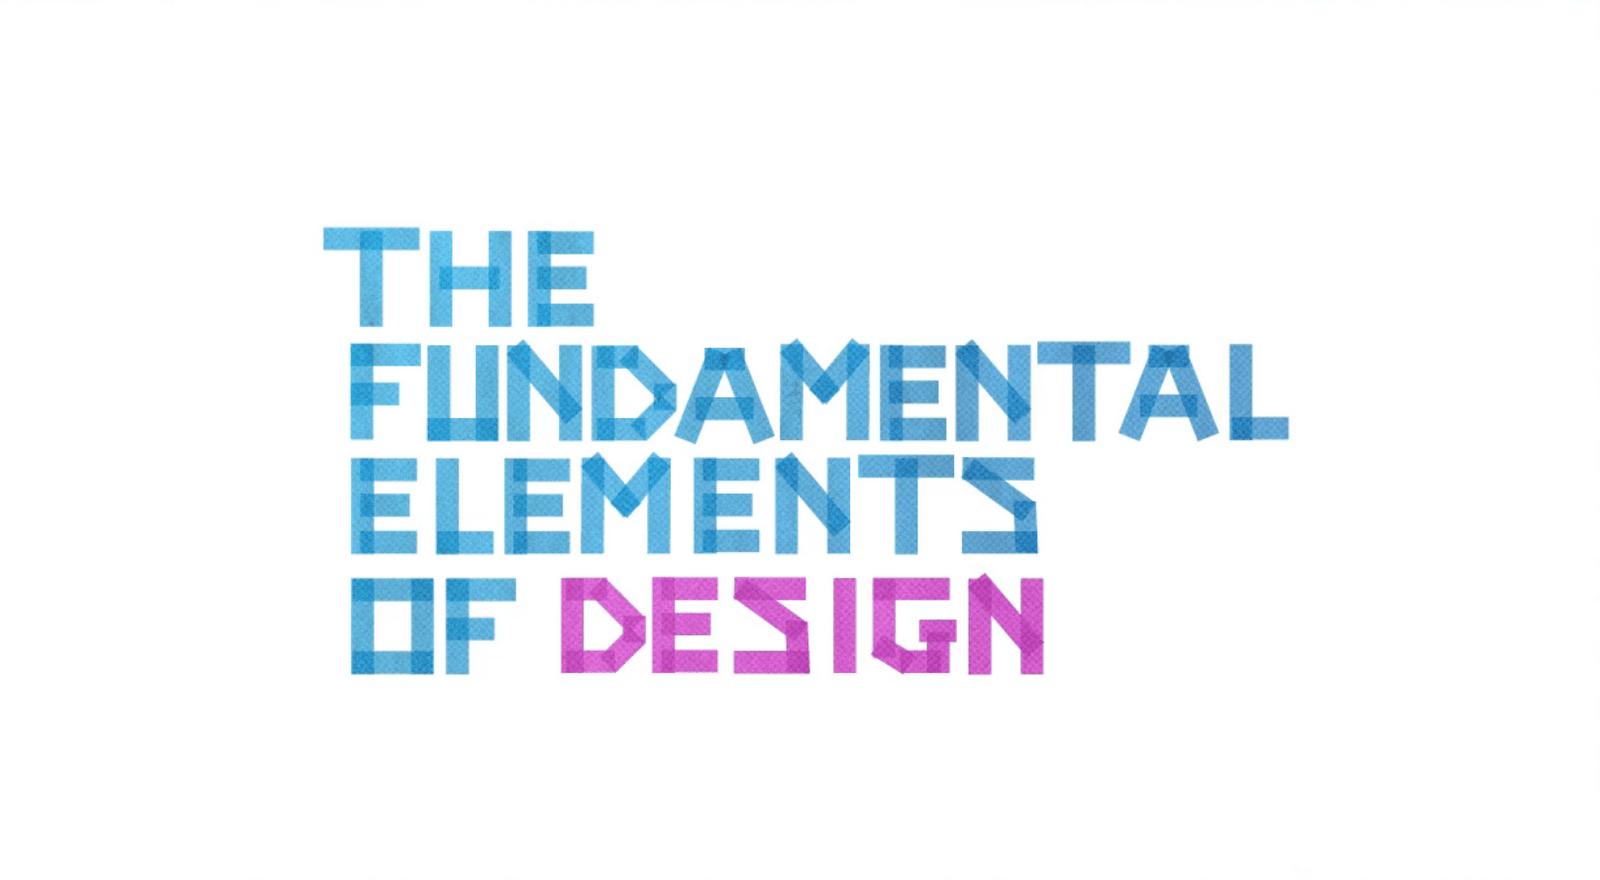 15 12 Elements Of Design Images